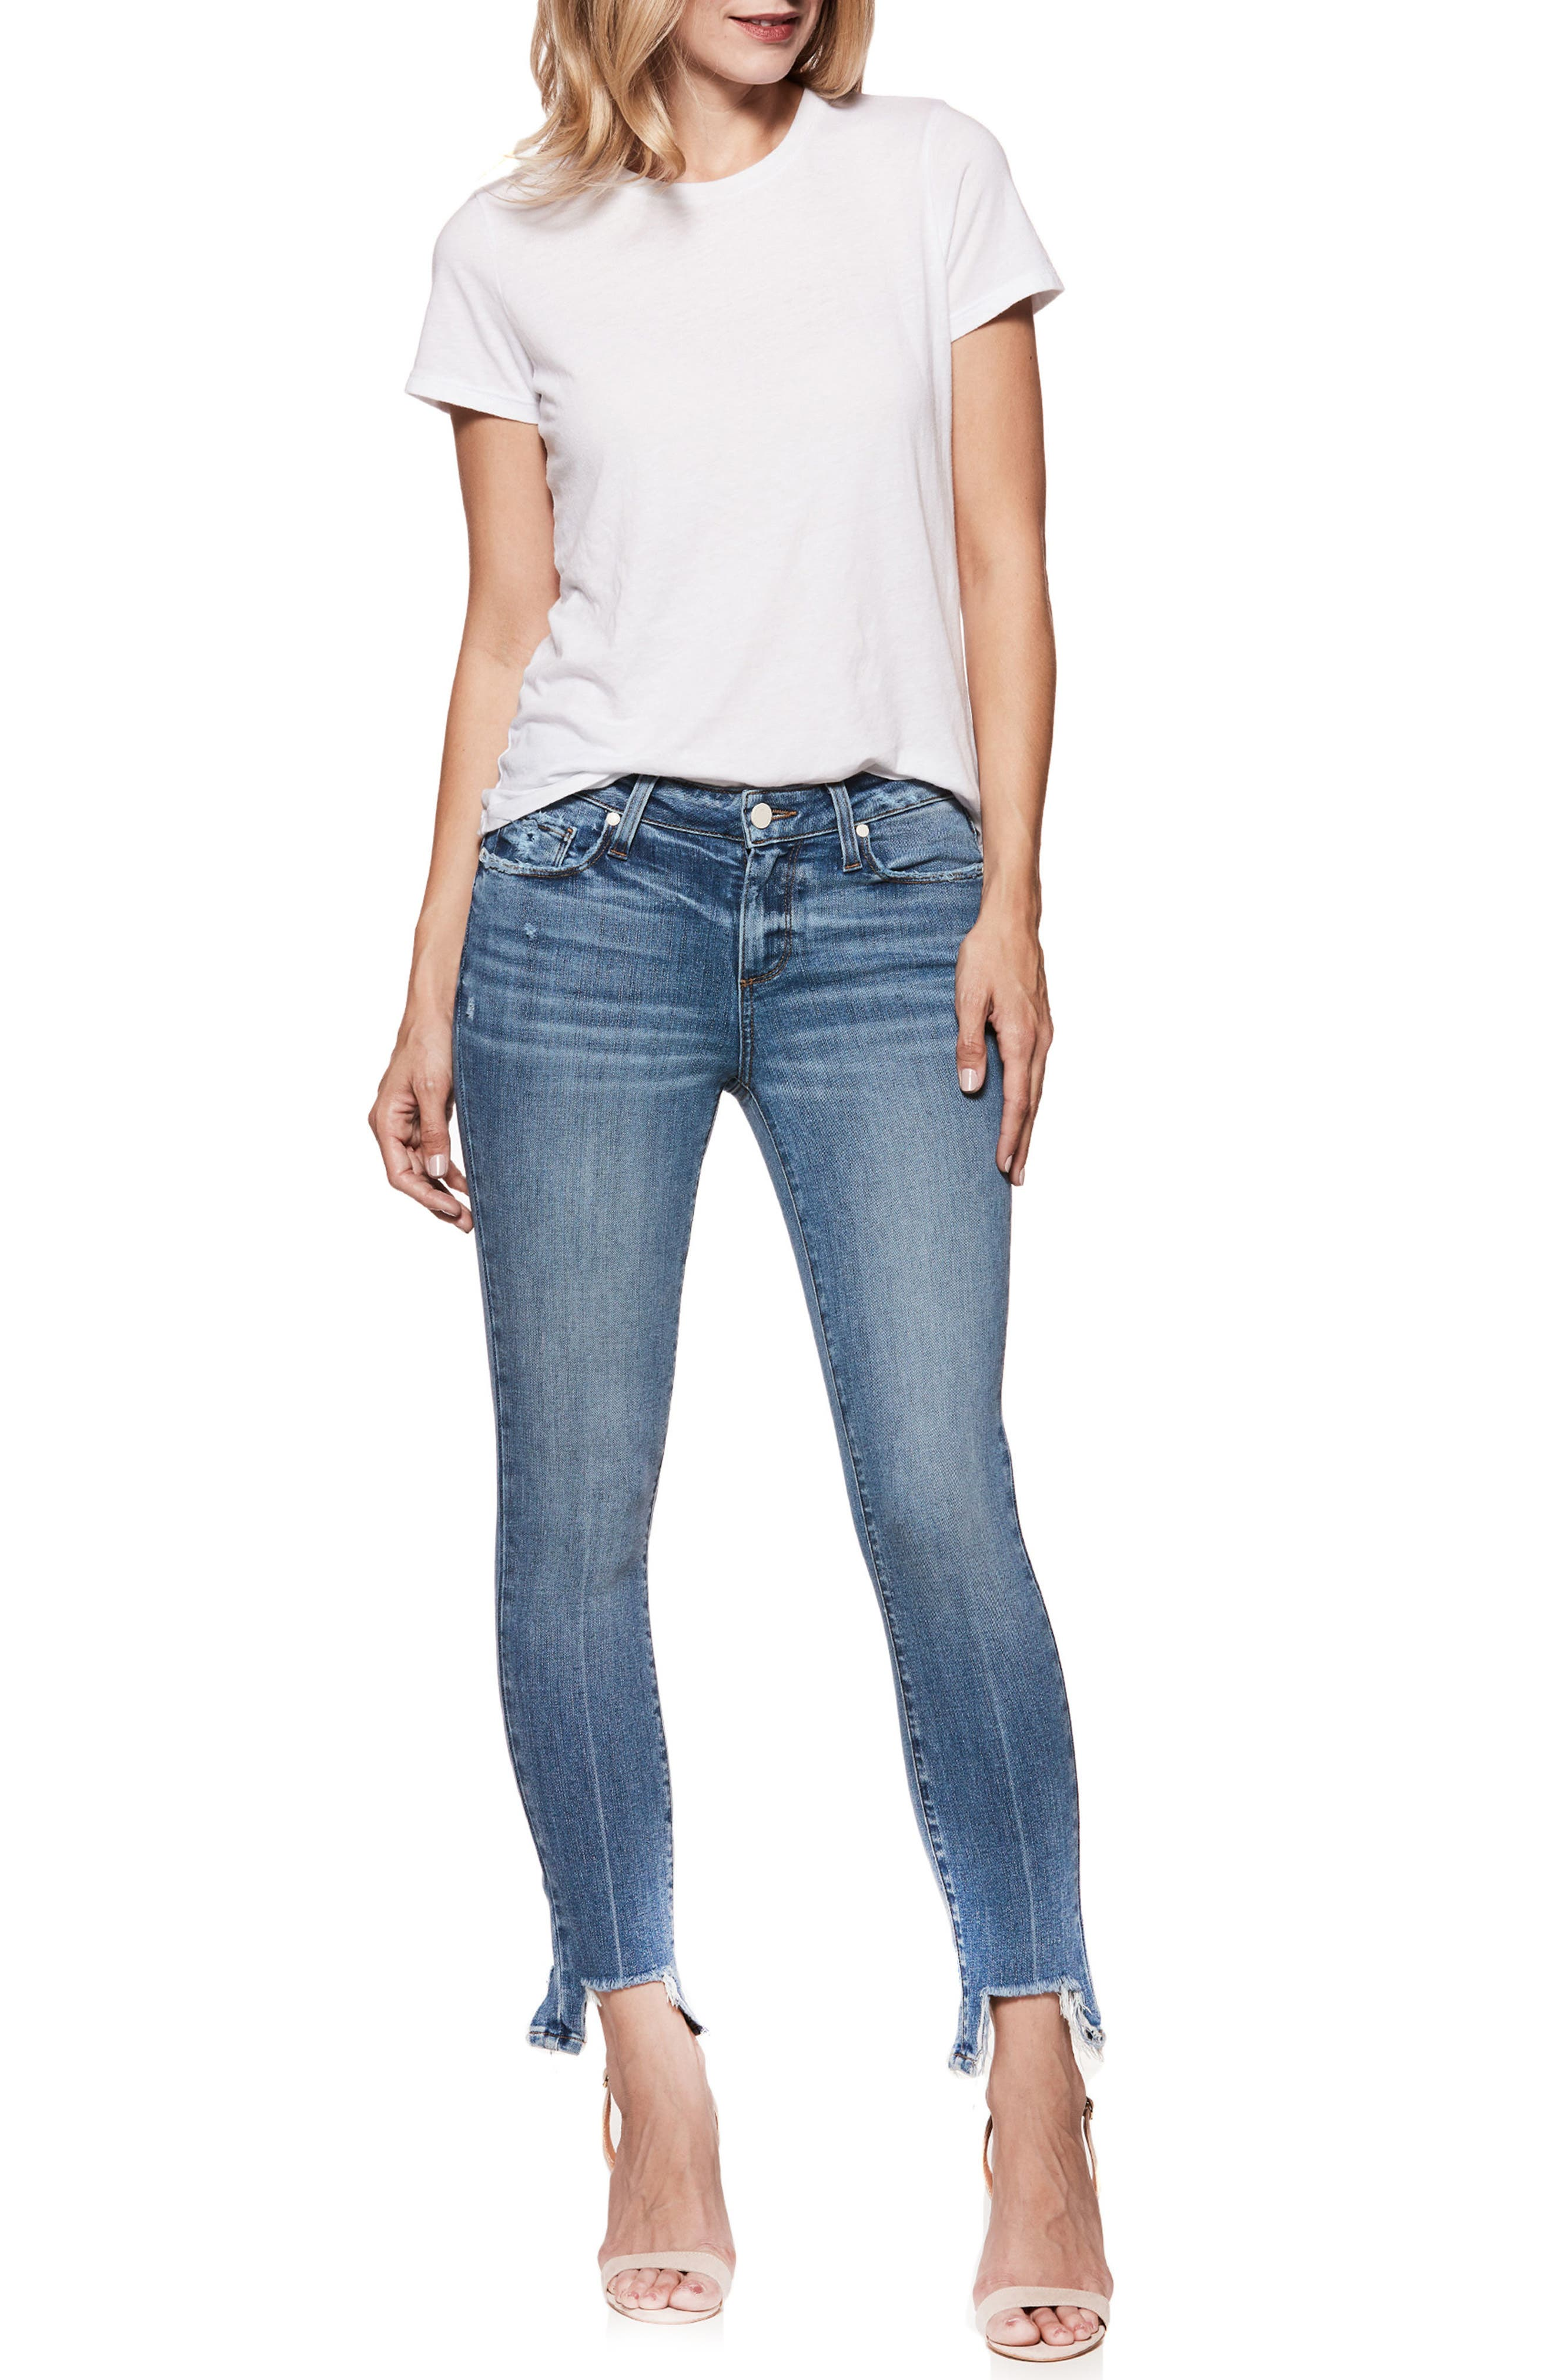 Transcend Vintage - Hoxton High Waist Ankle Skinny Jeans,                             Alternate thumbnail 8, color,                             ZAHARA